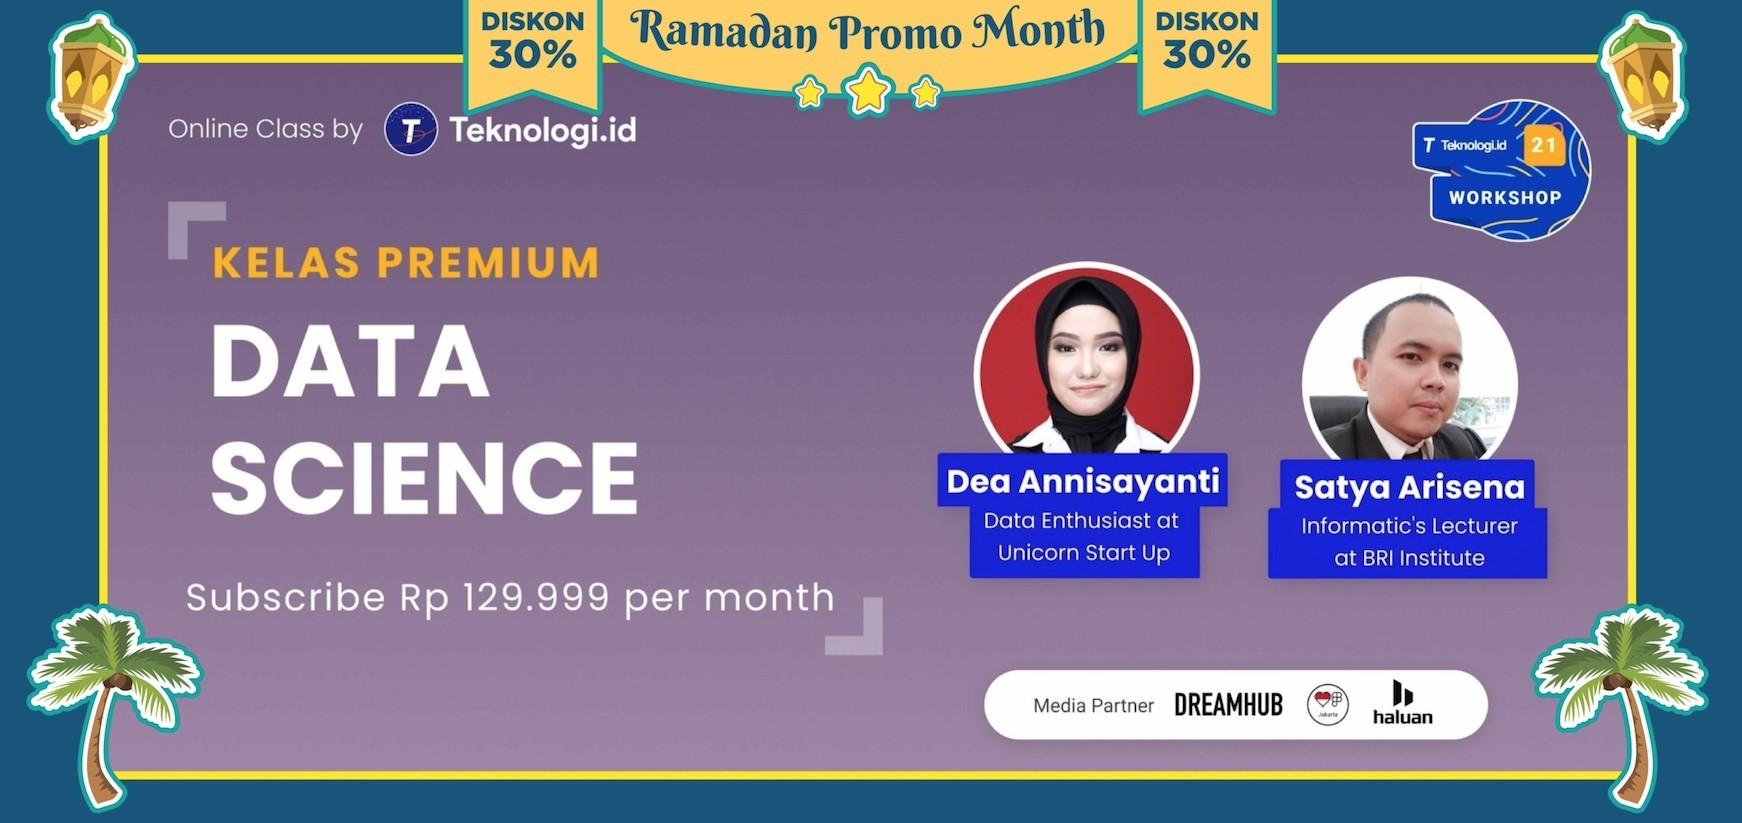 Kelas Online Premium - Data Science with Dea Annisayanti and Satya Arisena